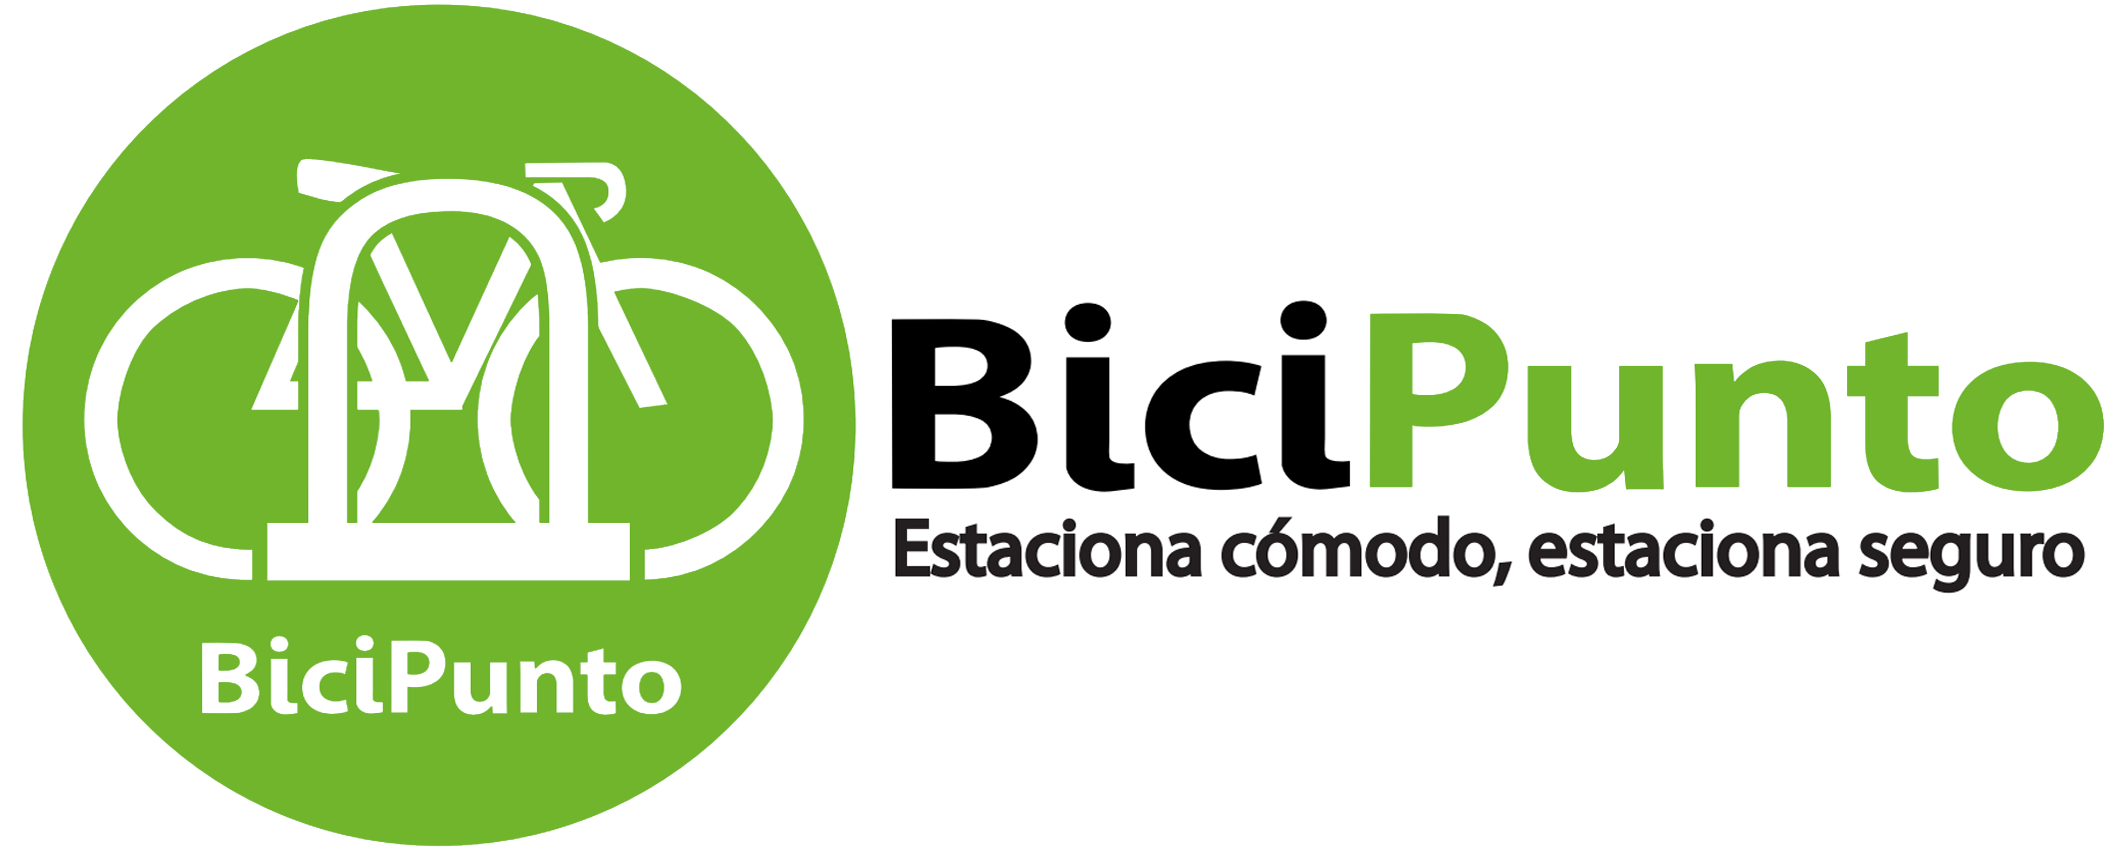 Bicipunto